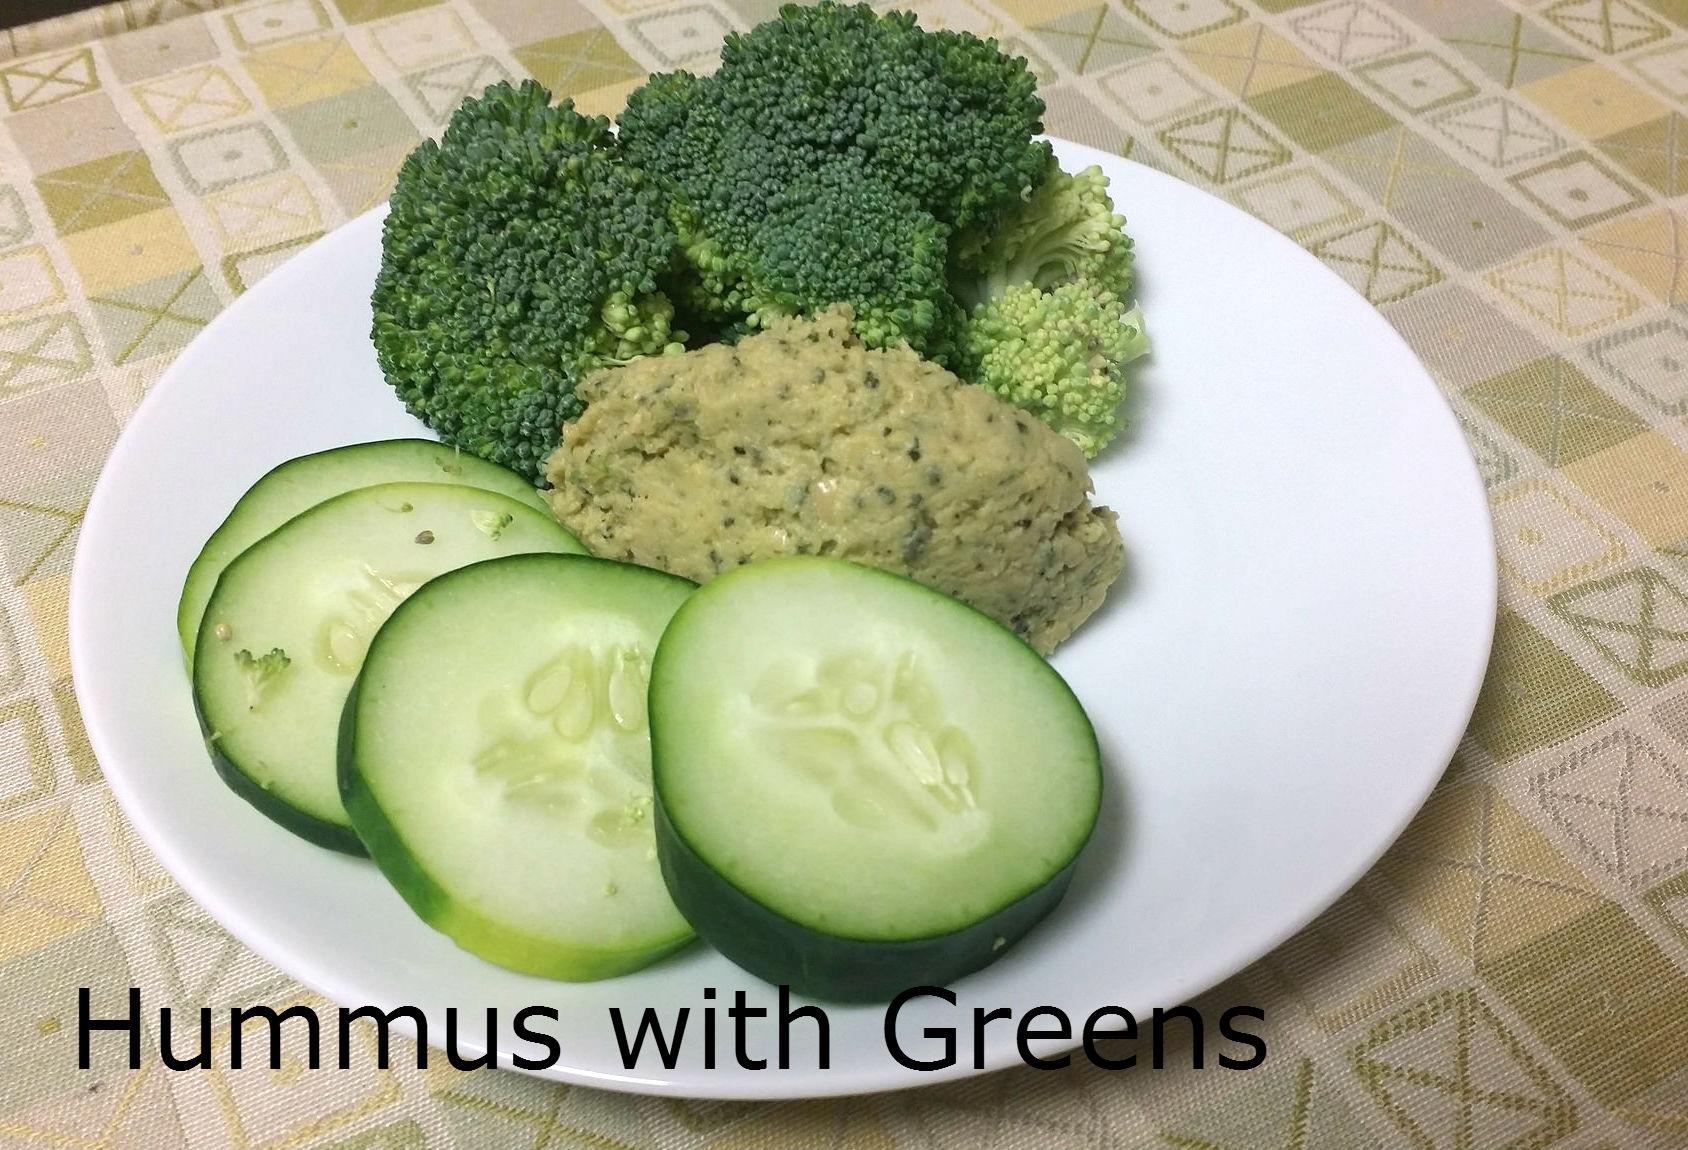 Hummus with Greens